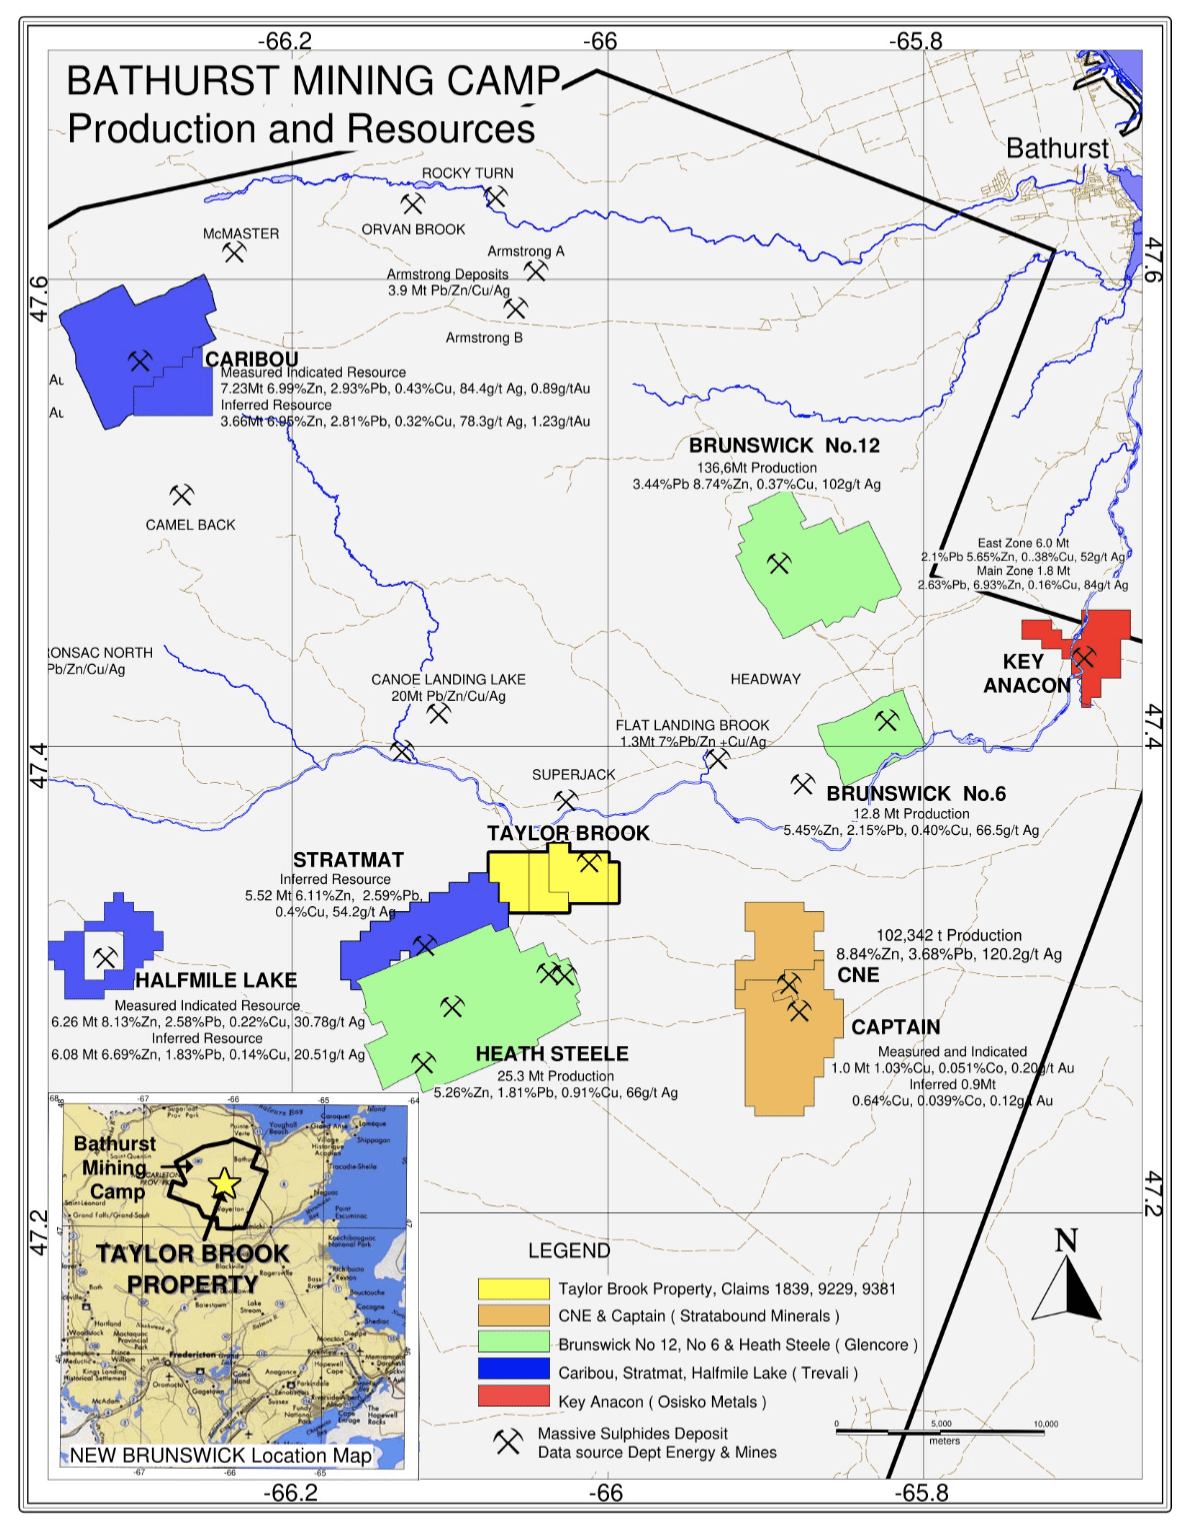 Jaeger Resources Bathurst Mining Camp